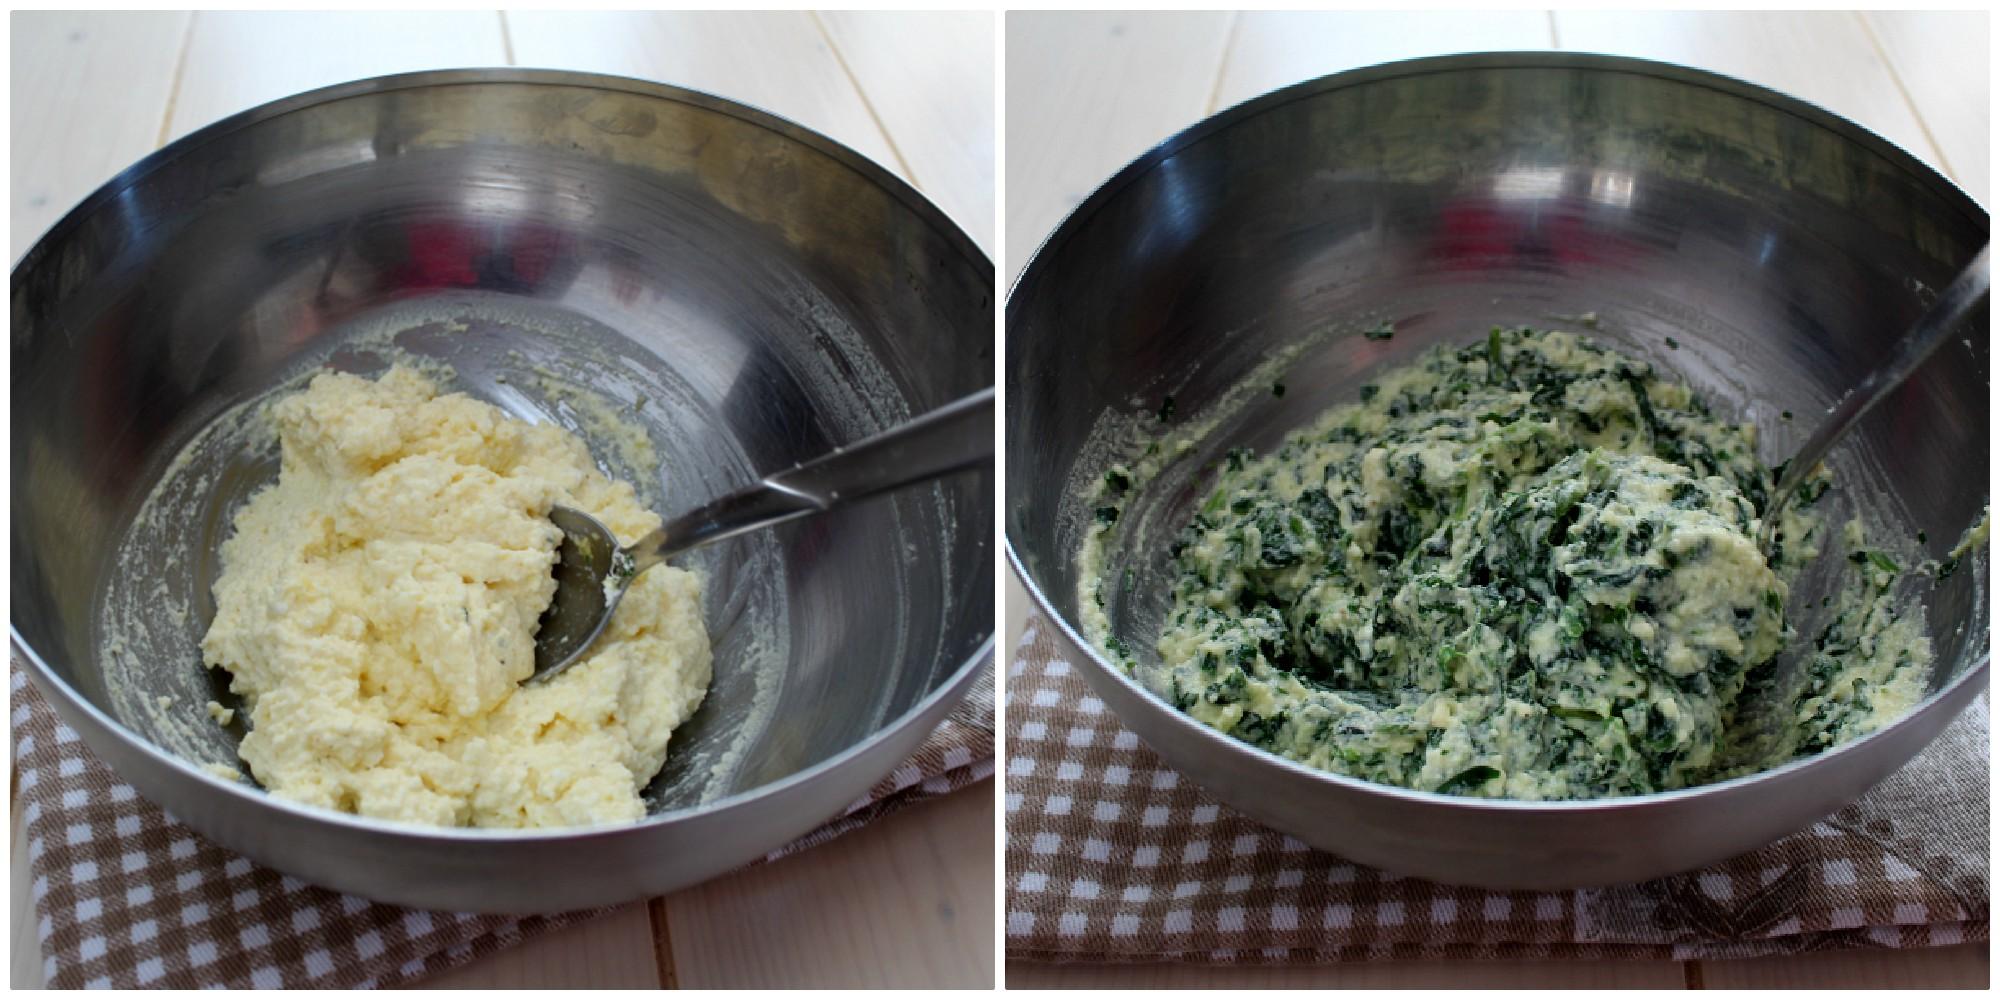 Torta salata ricotta e spinaci collage